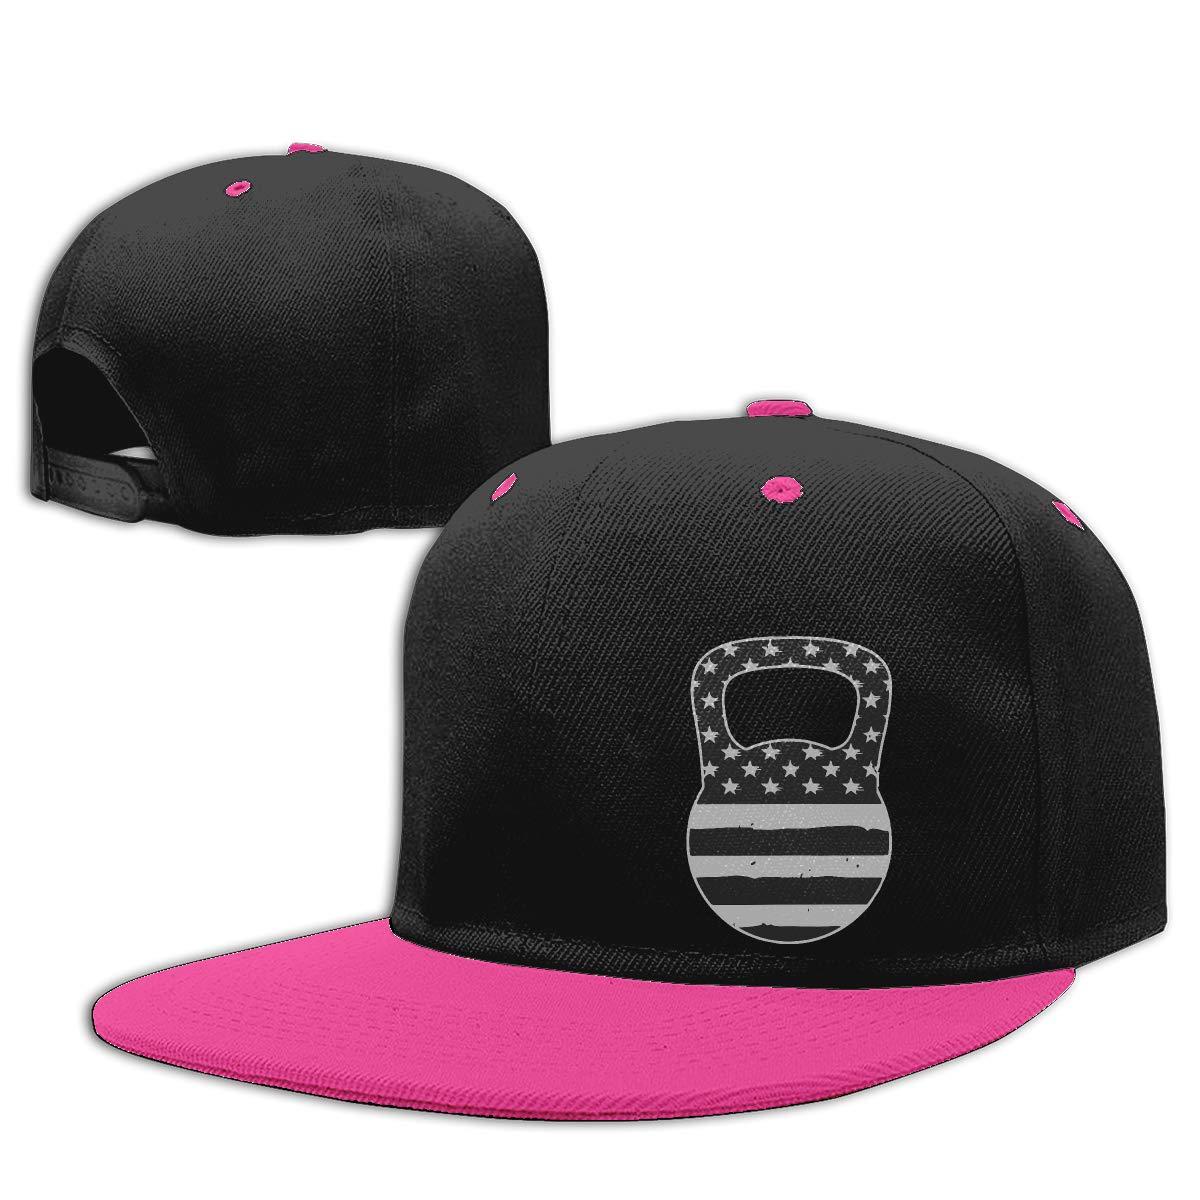 Kettlebell American Flag Fashion Flat Peaked Baseball Caps NMG-01 Men and Women Hiphop Cap